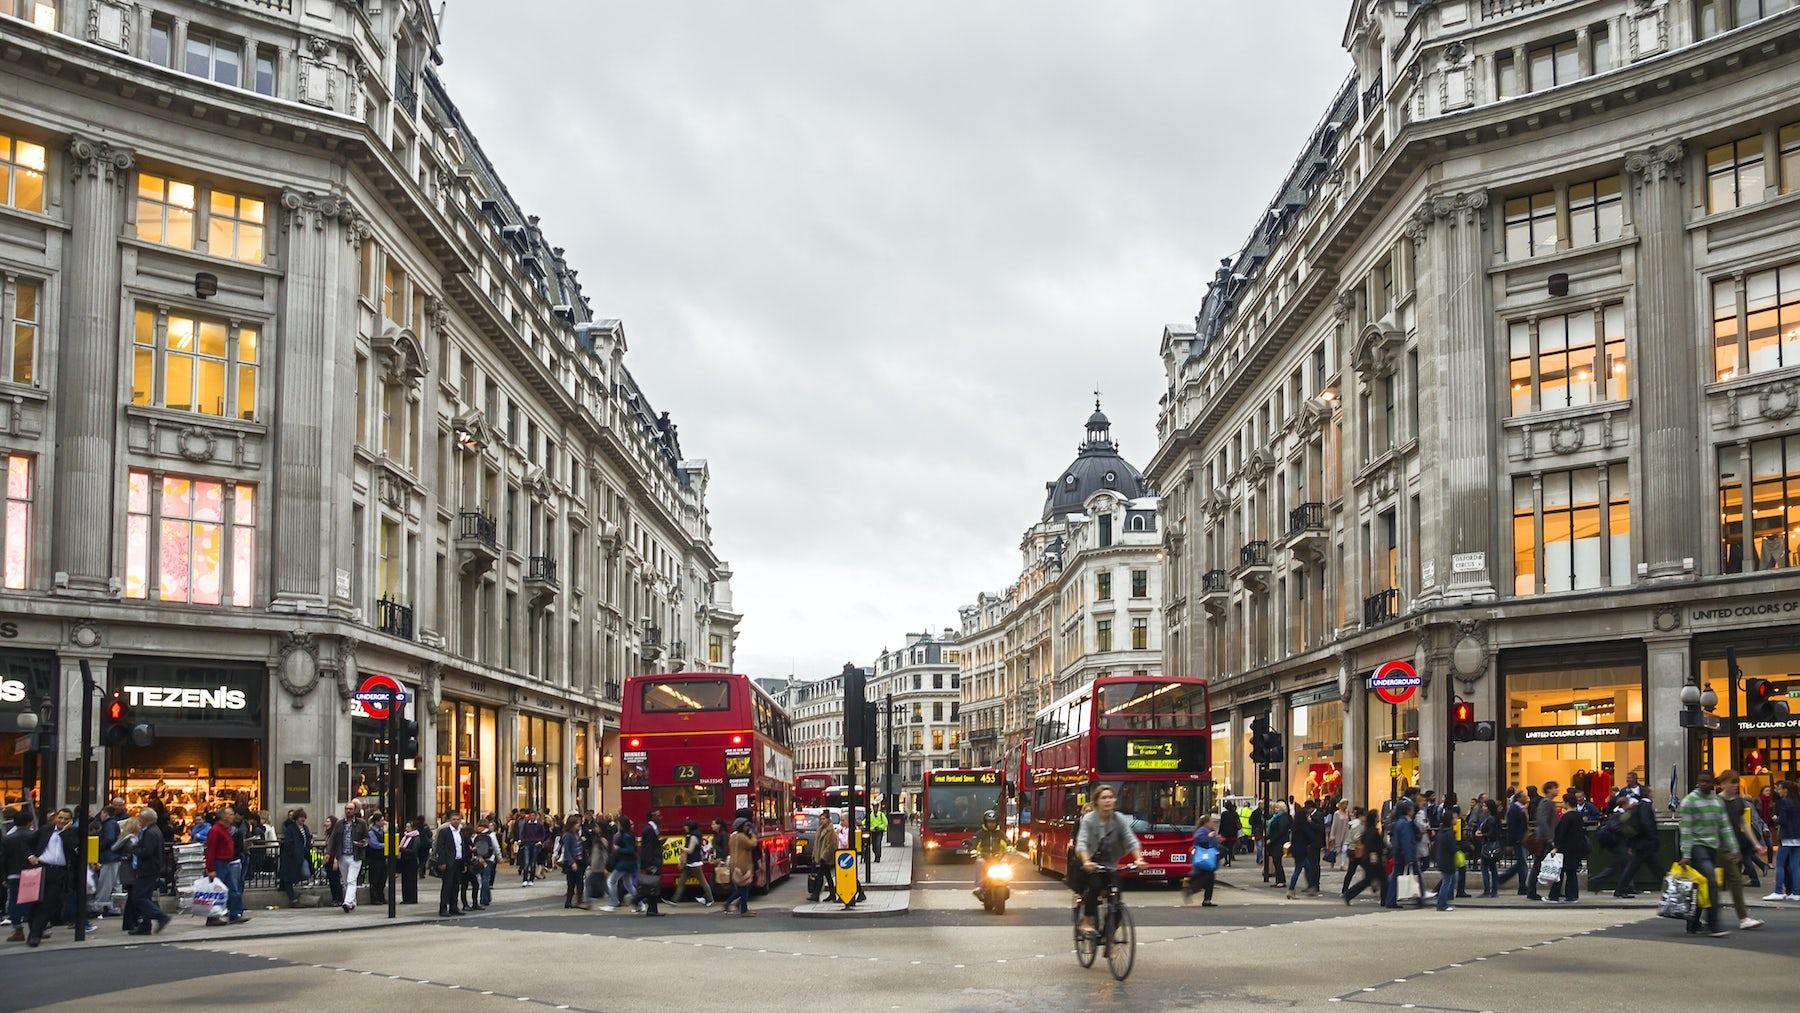 Oxford Circus London | Source: Shutterstock